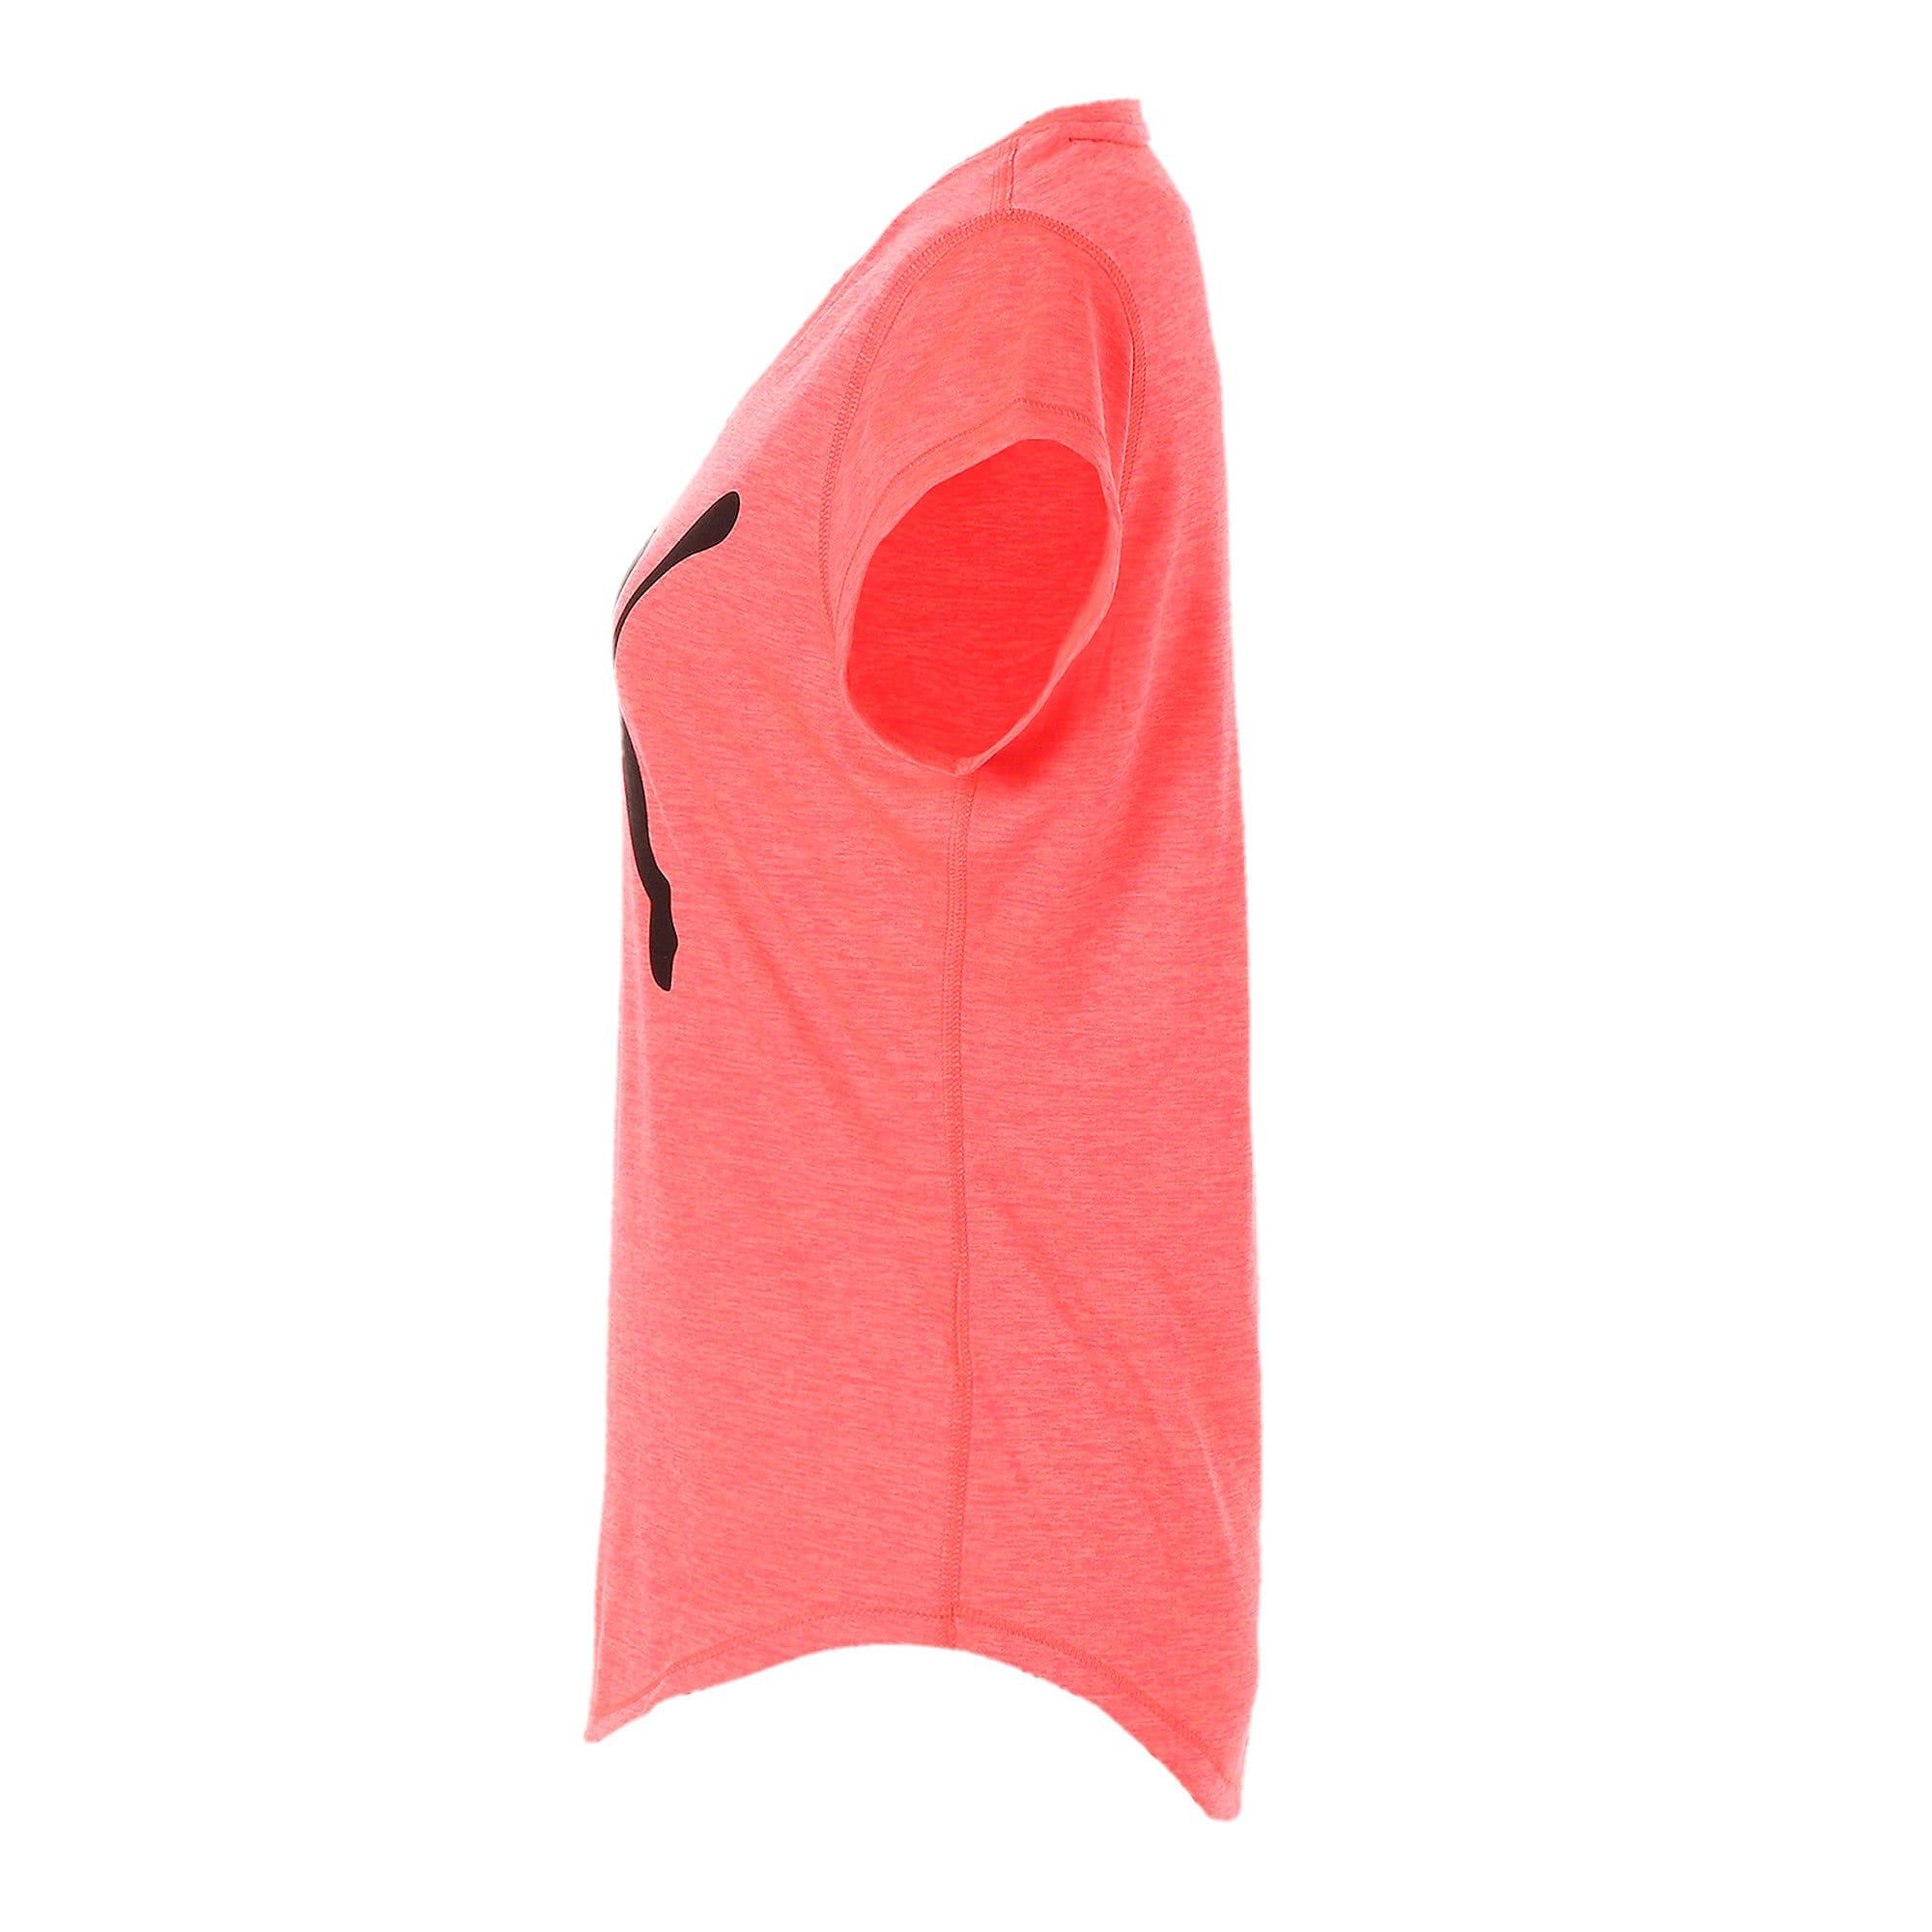 Thumbnail 5 of ヘザー キャット ウィメンズ ランニング Tシャツ 半袖, Pink Alert, medium-JPN